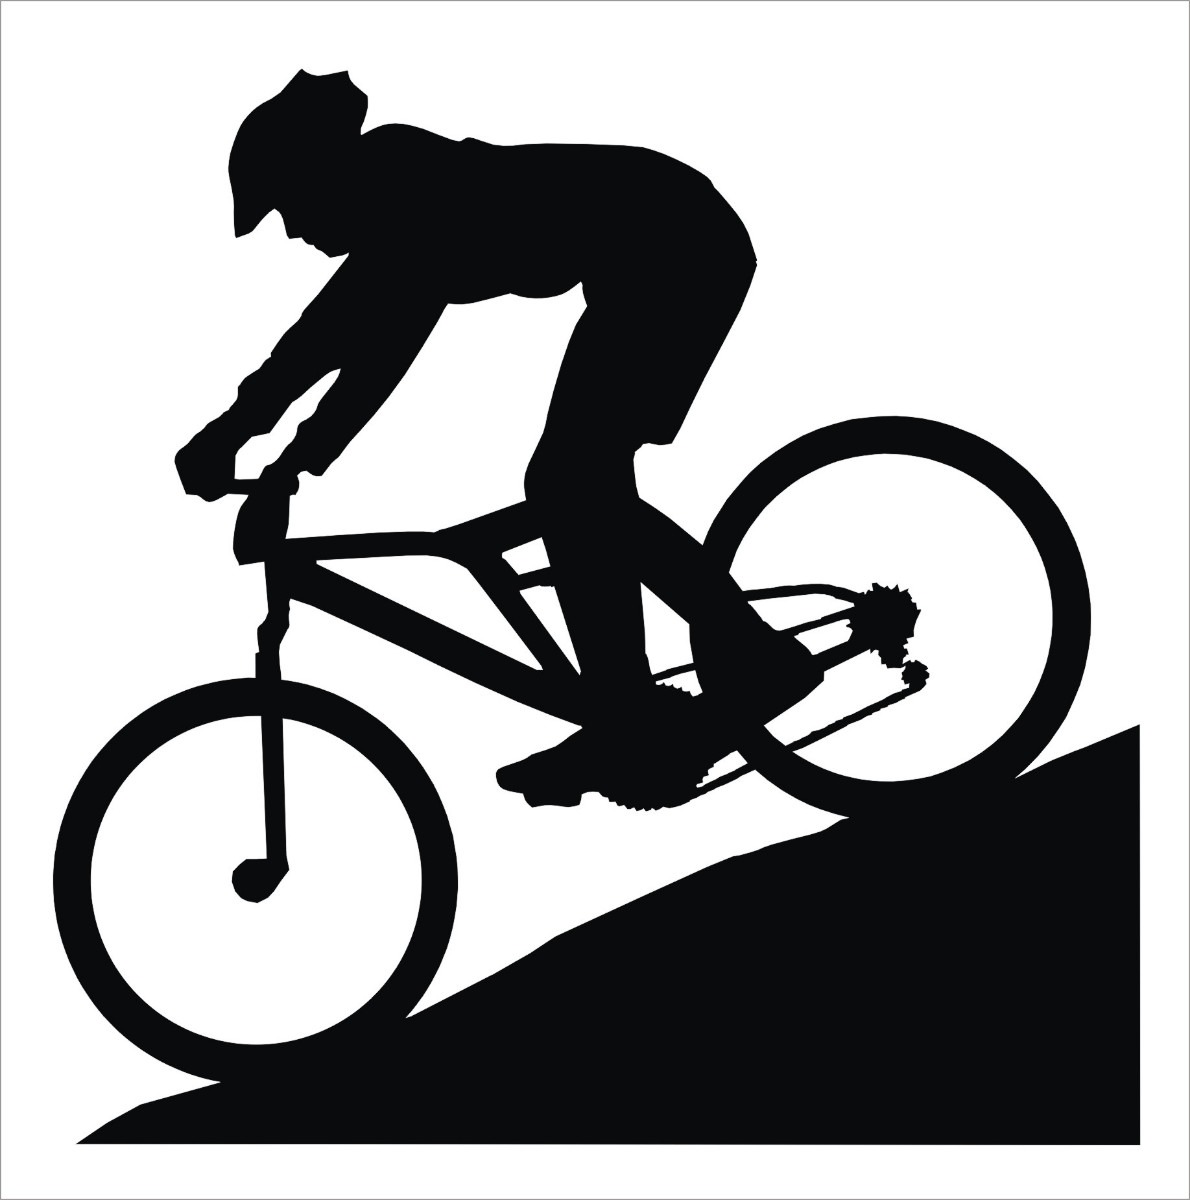 Armario Jardin Resina ~ Adesivo Mountain Bike Downhill Shimano R$ 7,00 em Mercado Livre